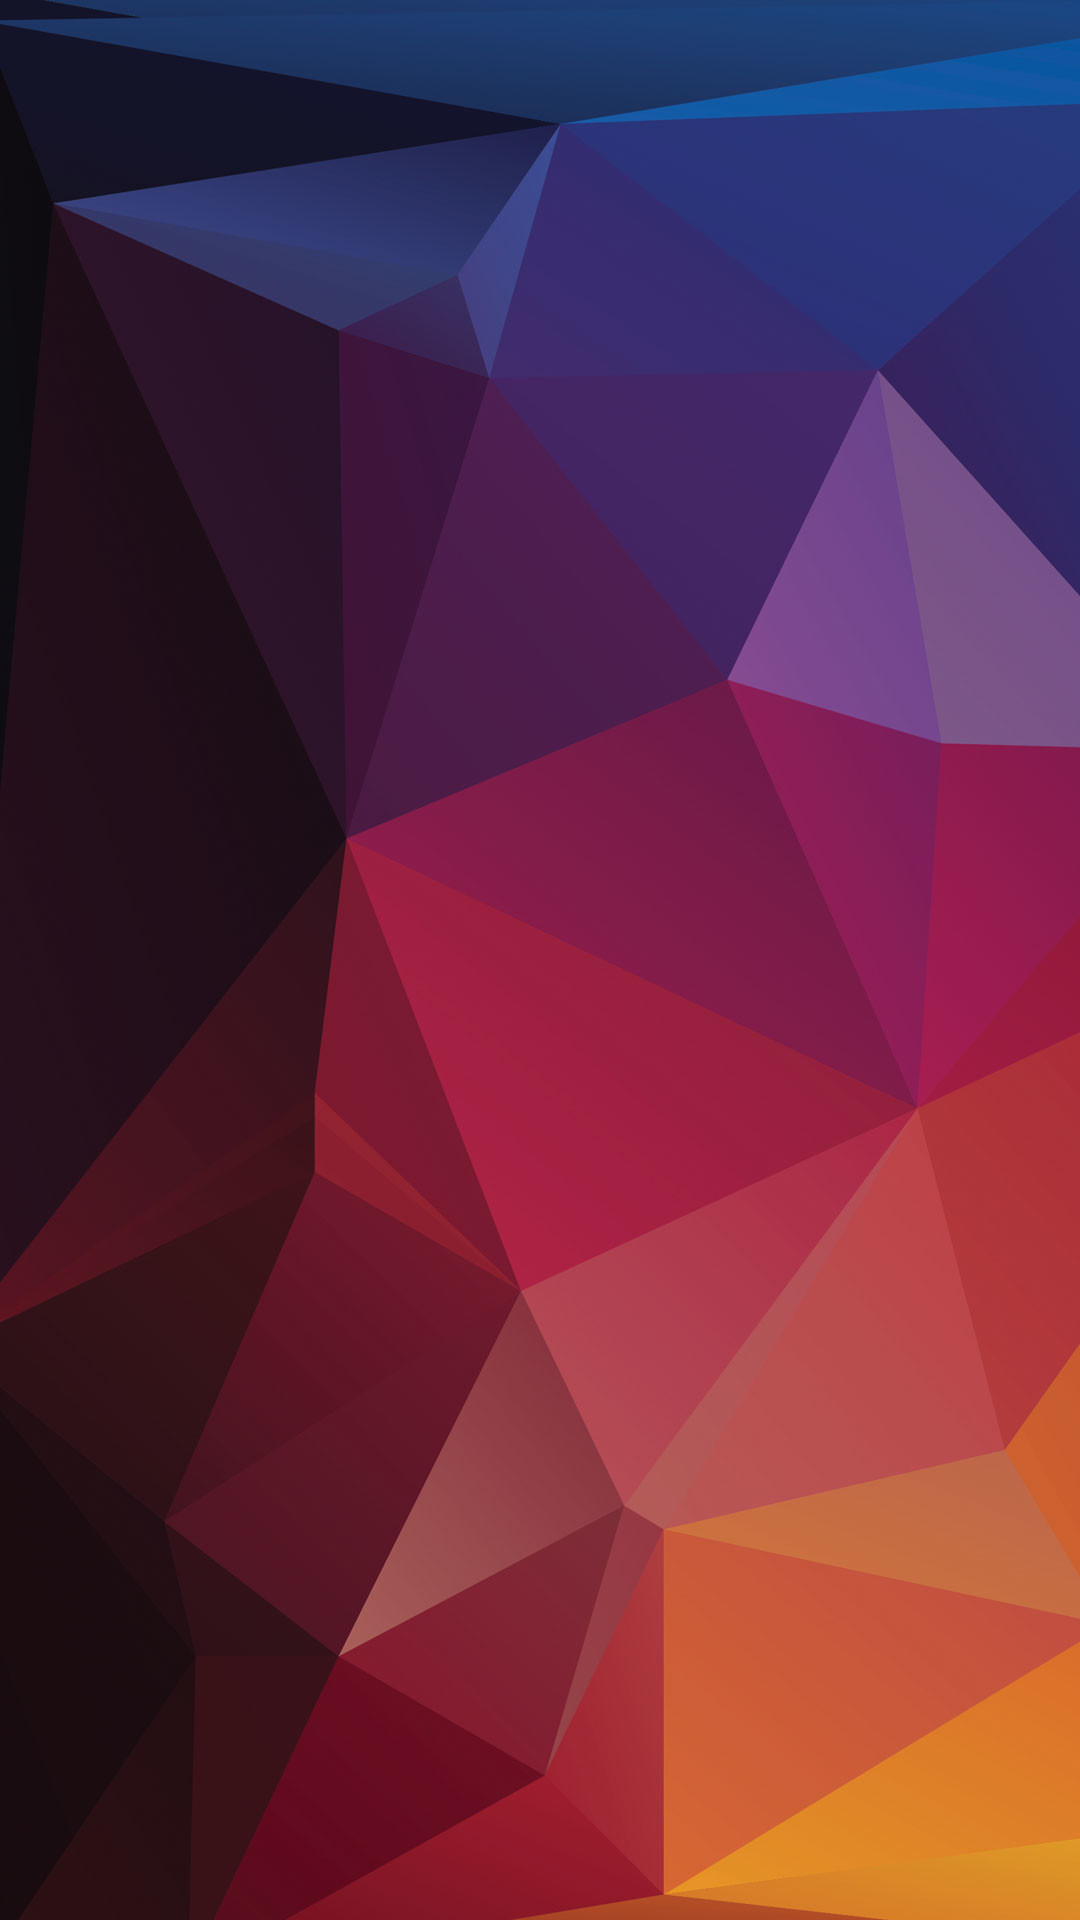 polygon-apple-iphone-7-plus-background …